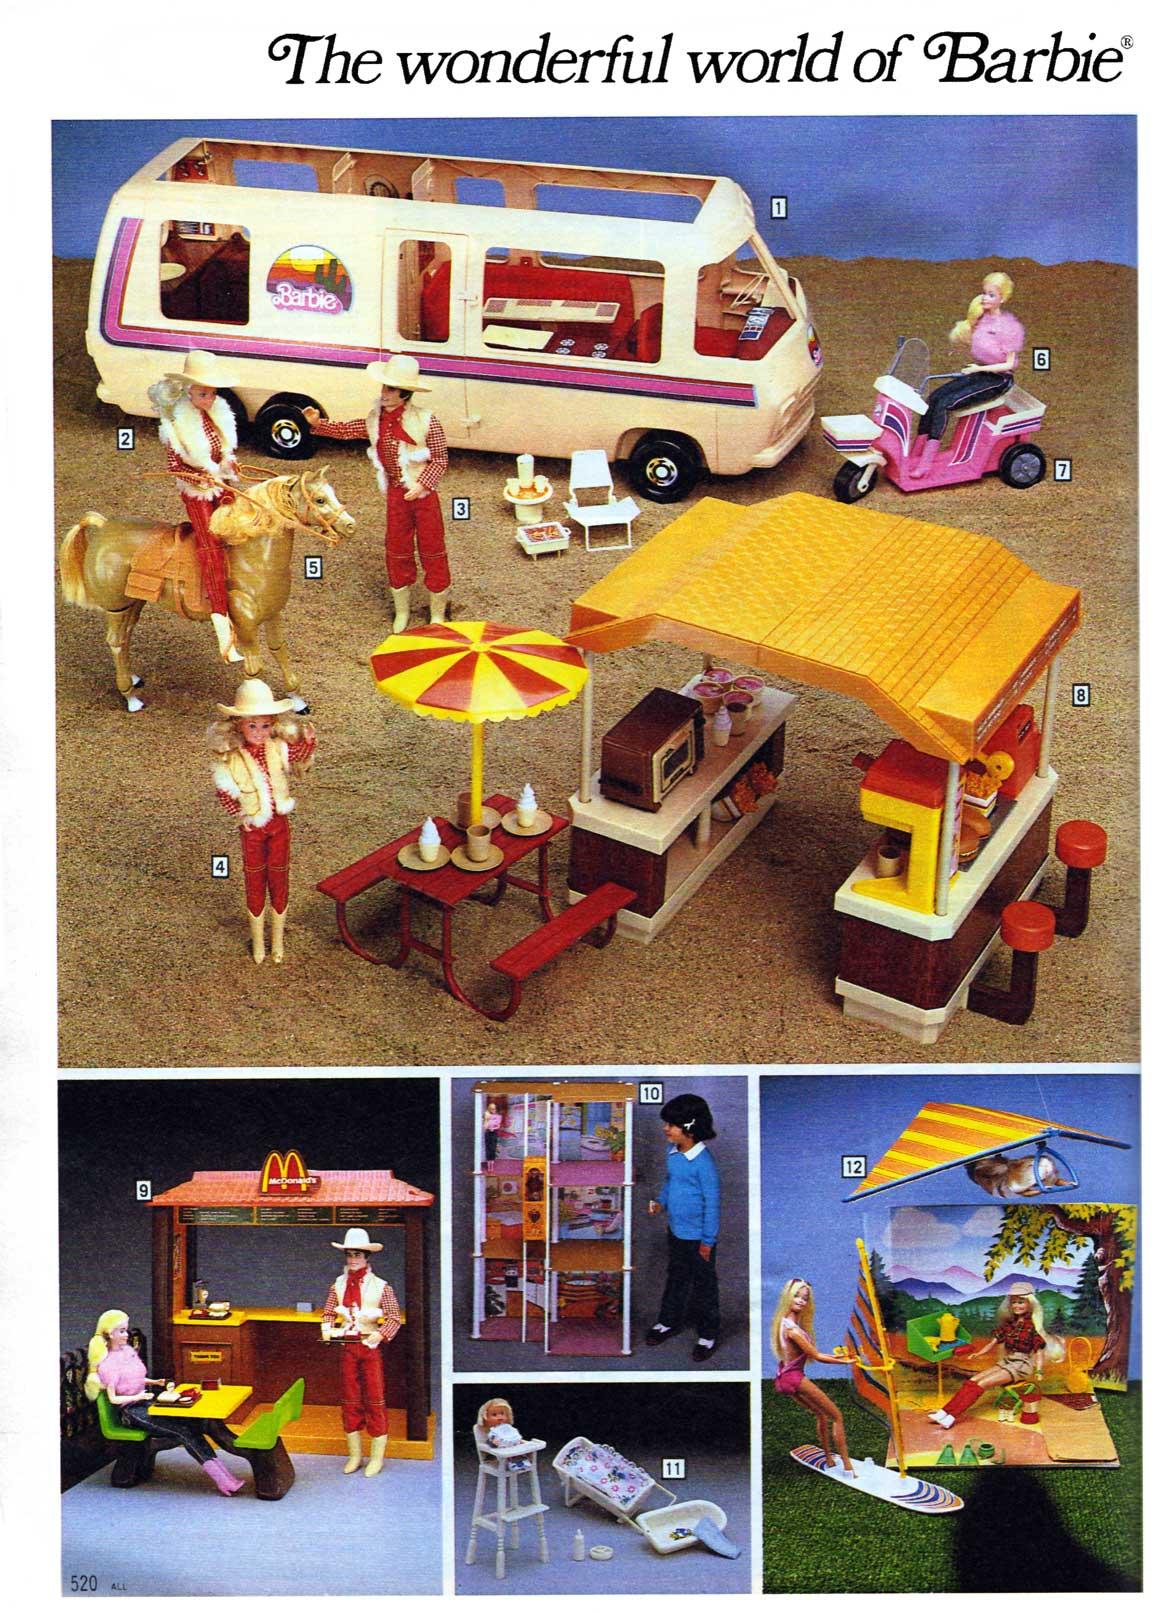 Sears Christmas Wish Book.Barbie S World Sears Christmas Wishbook 1983 The